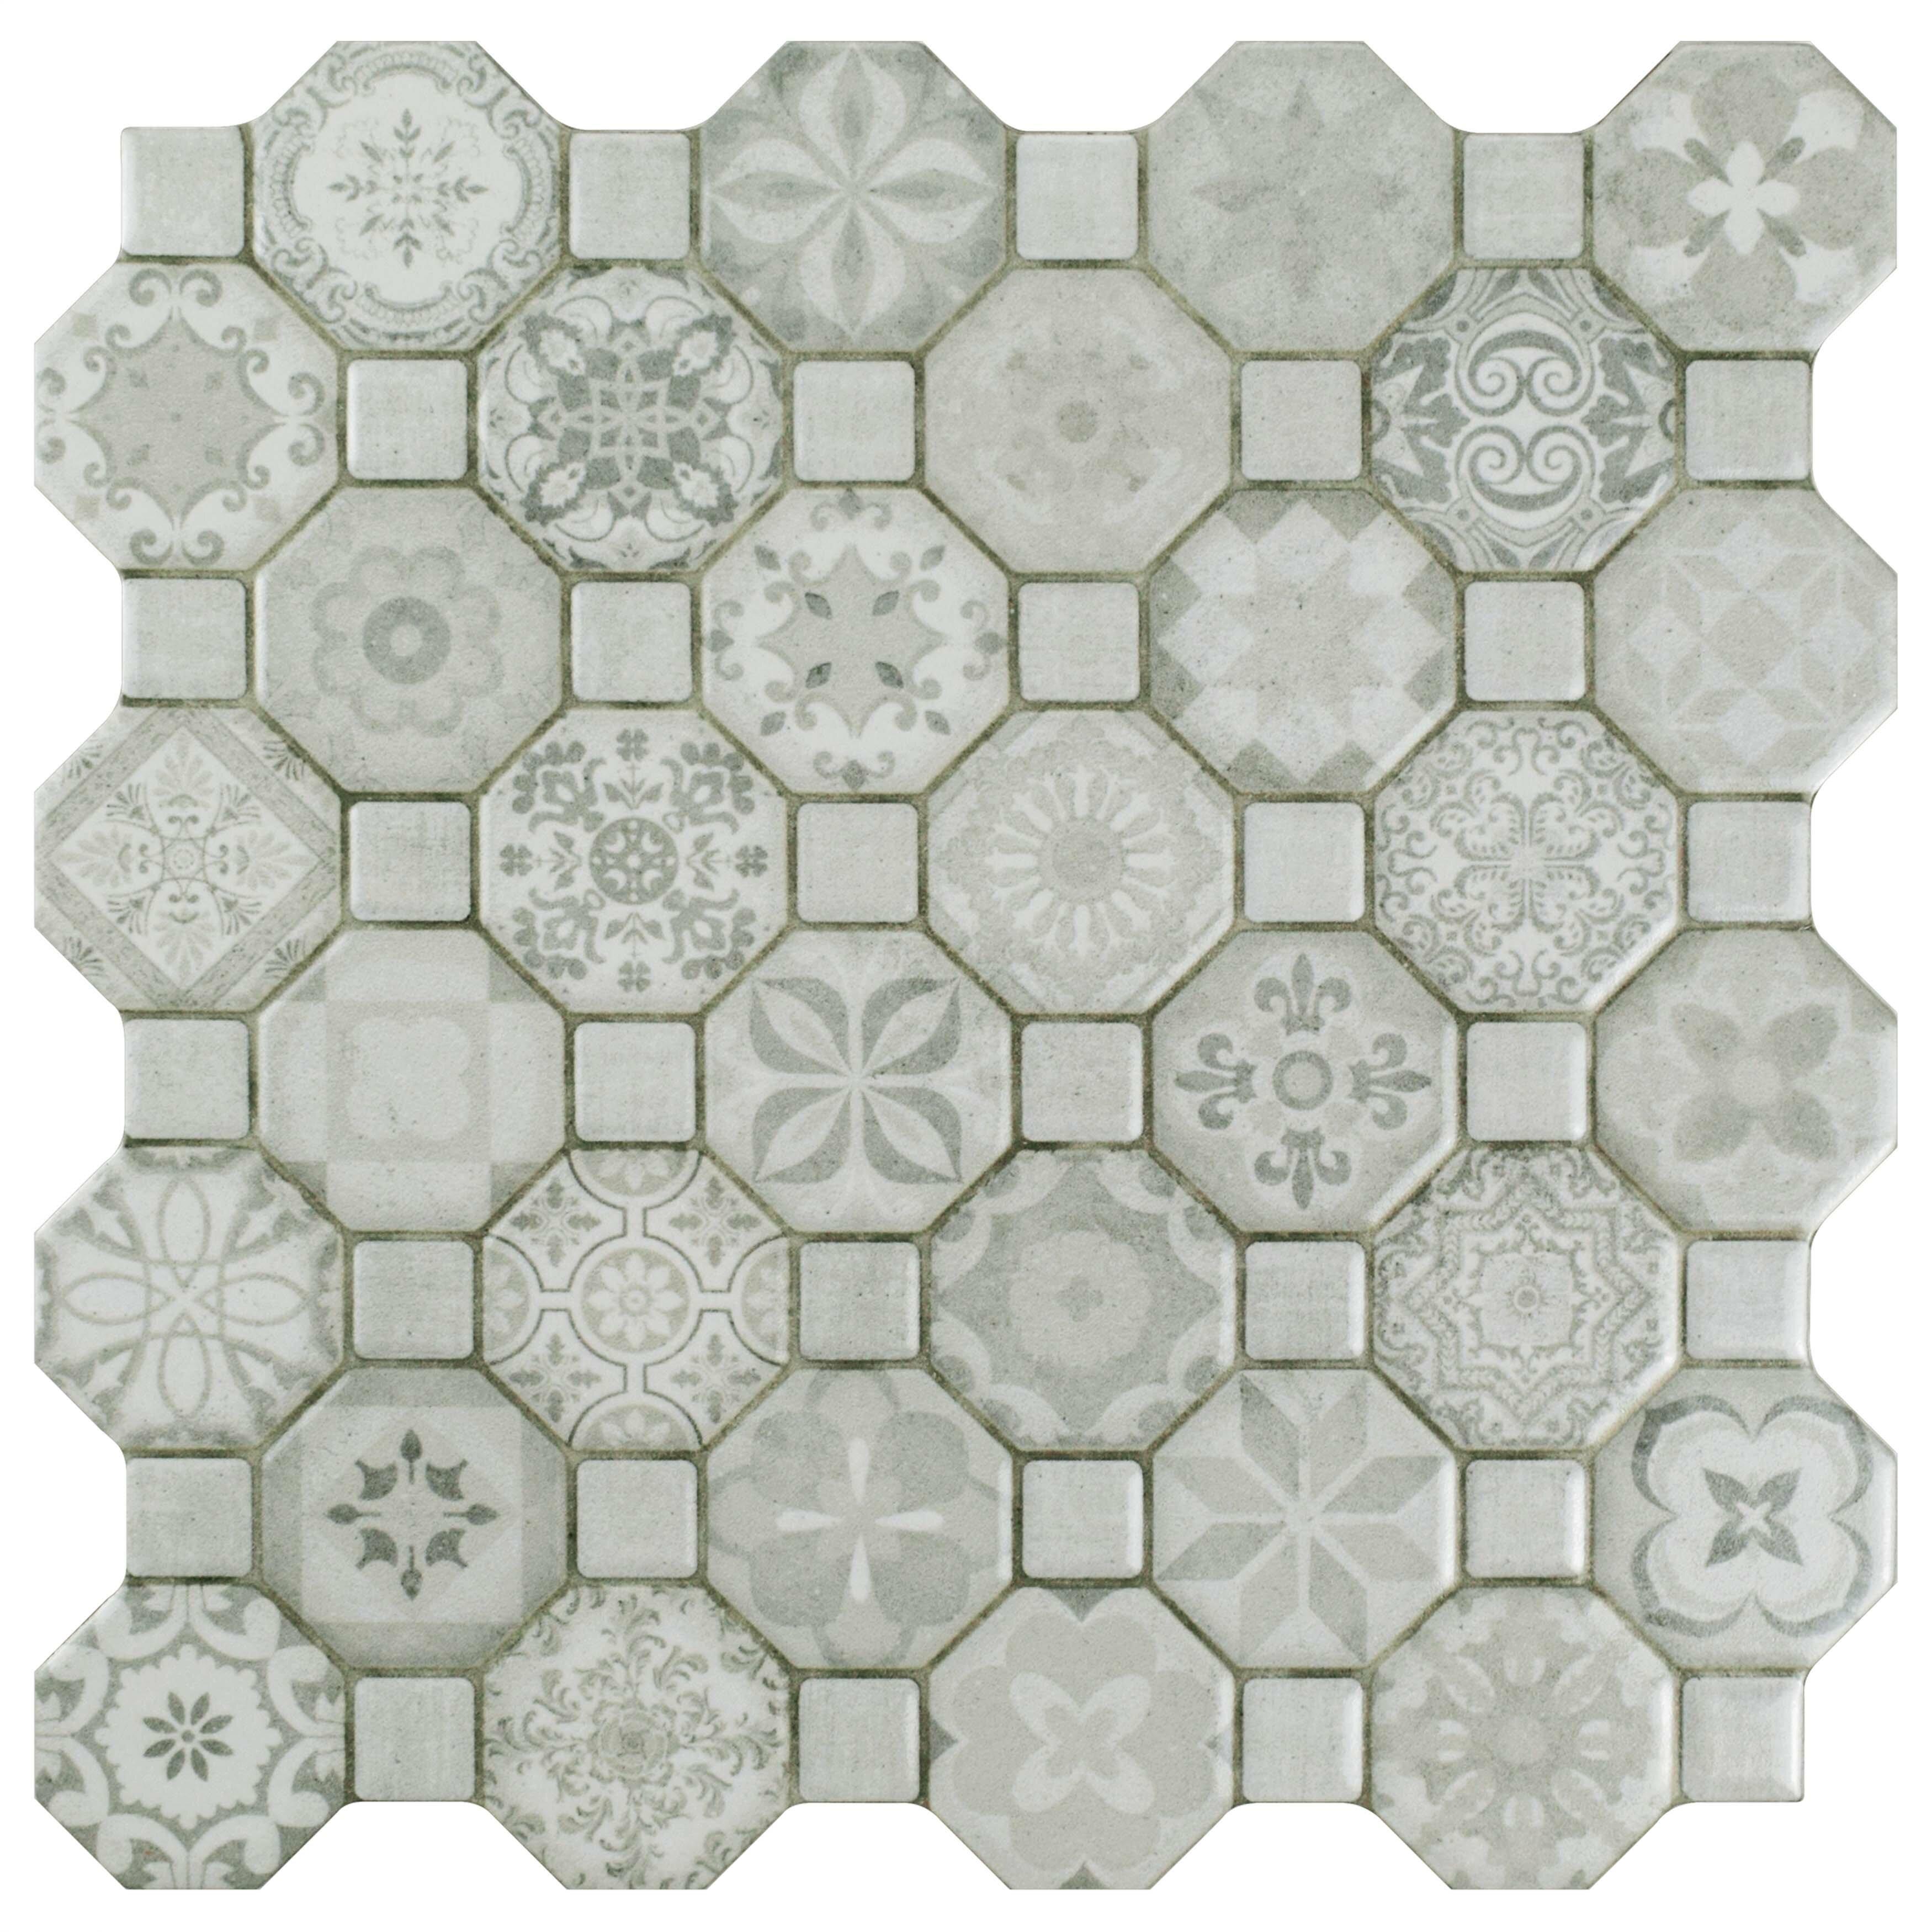 Elitetile Edredon 1225 X 1225 Ceramic Tile In Gray Reviews